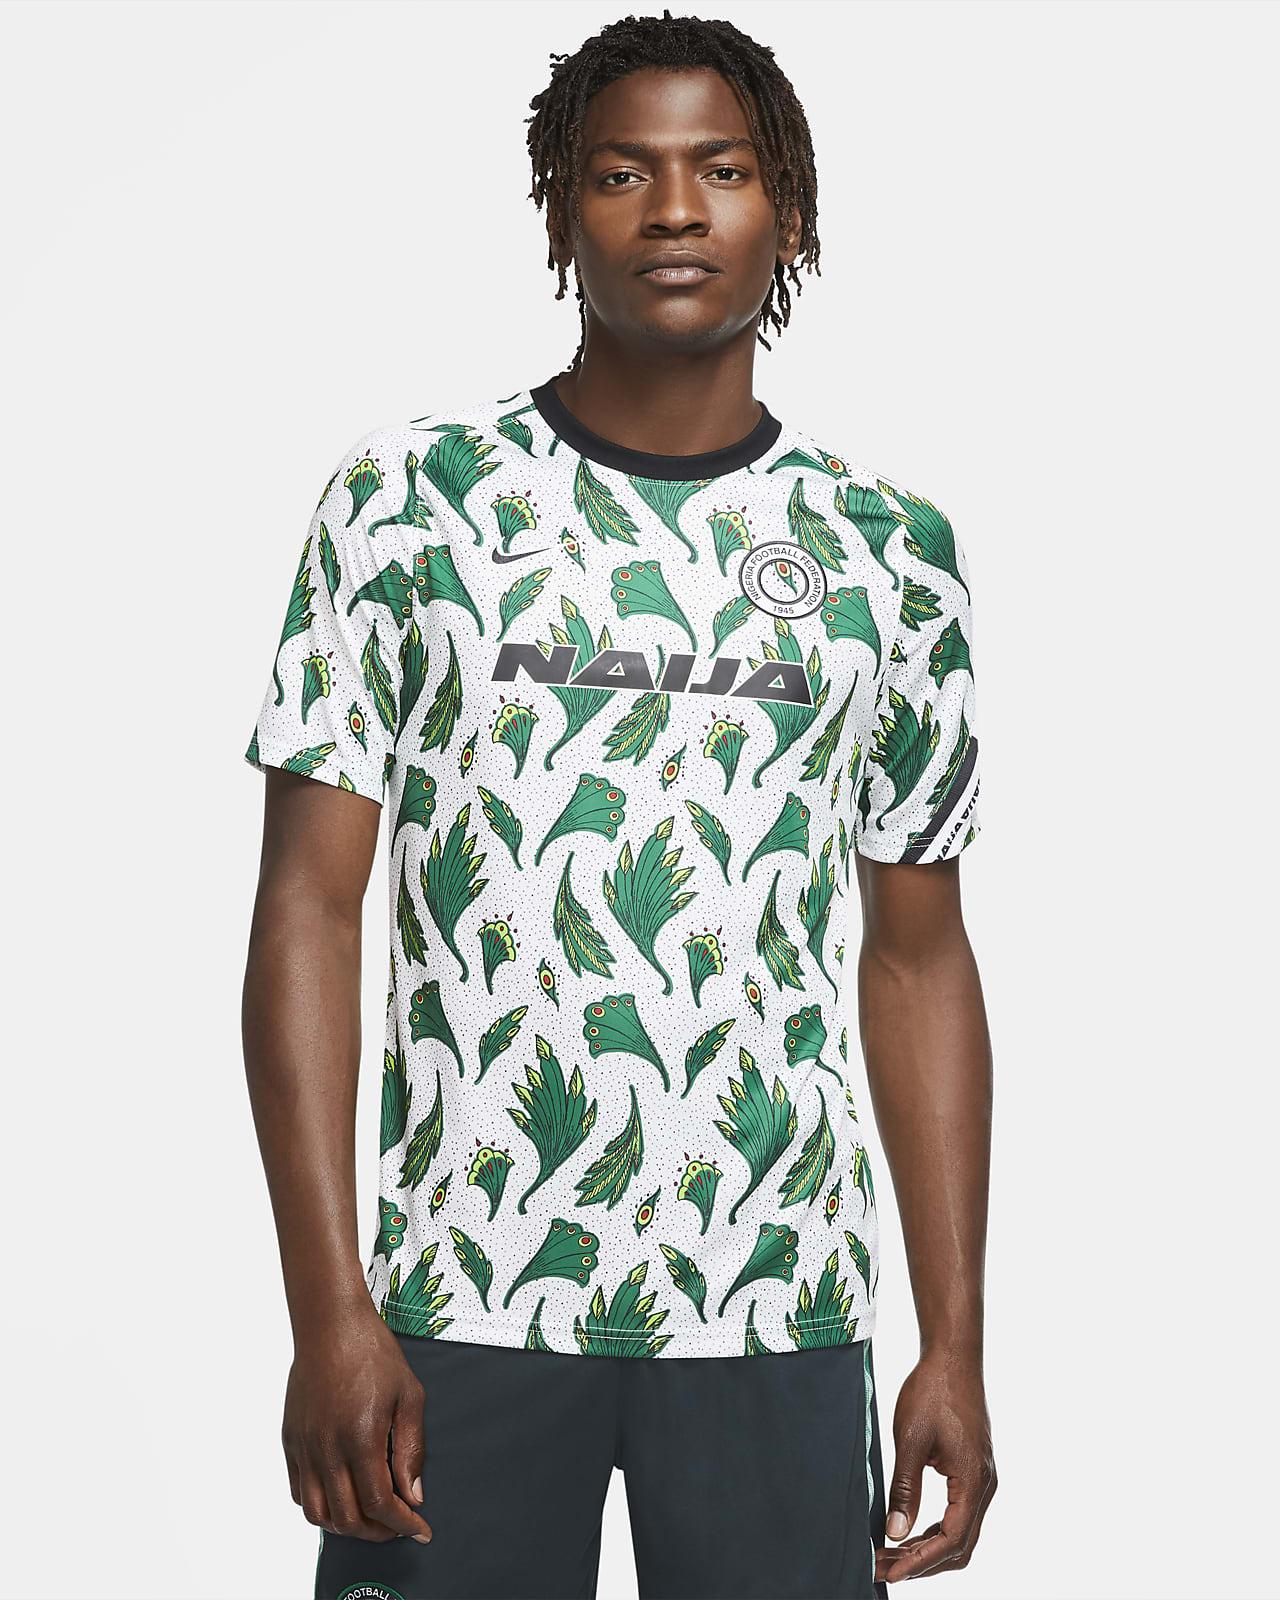 Nigeria Men's Pre-Match Short-Sleeve Football Top